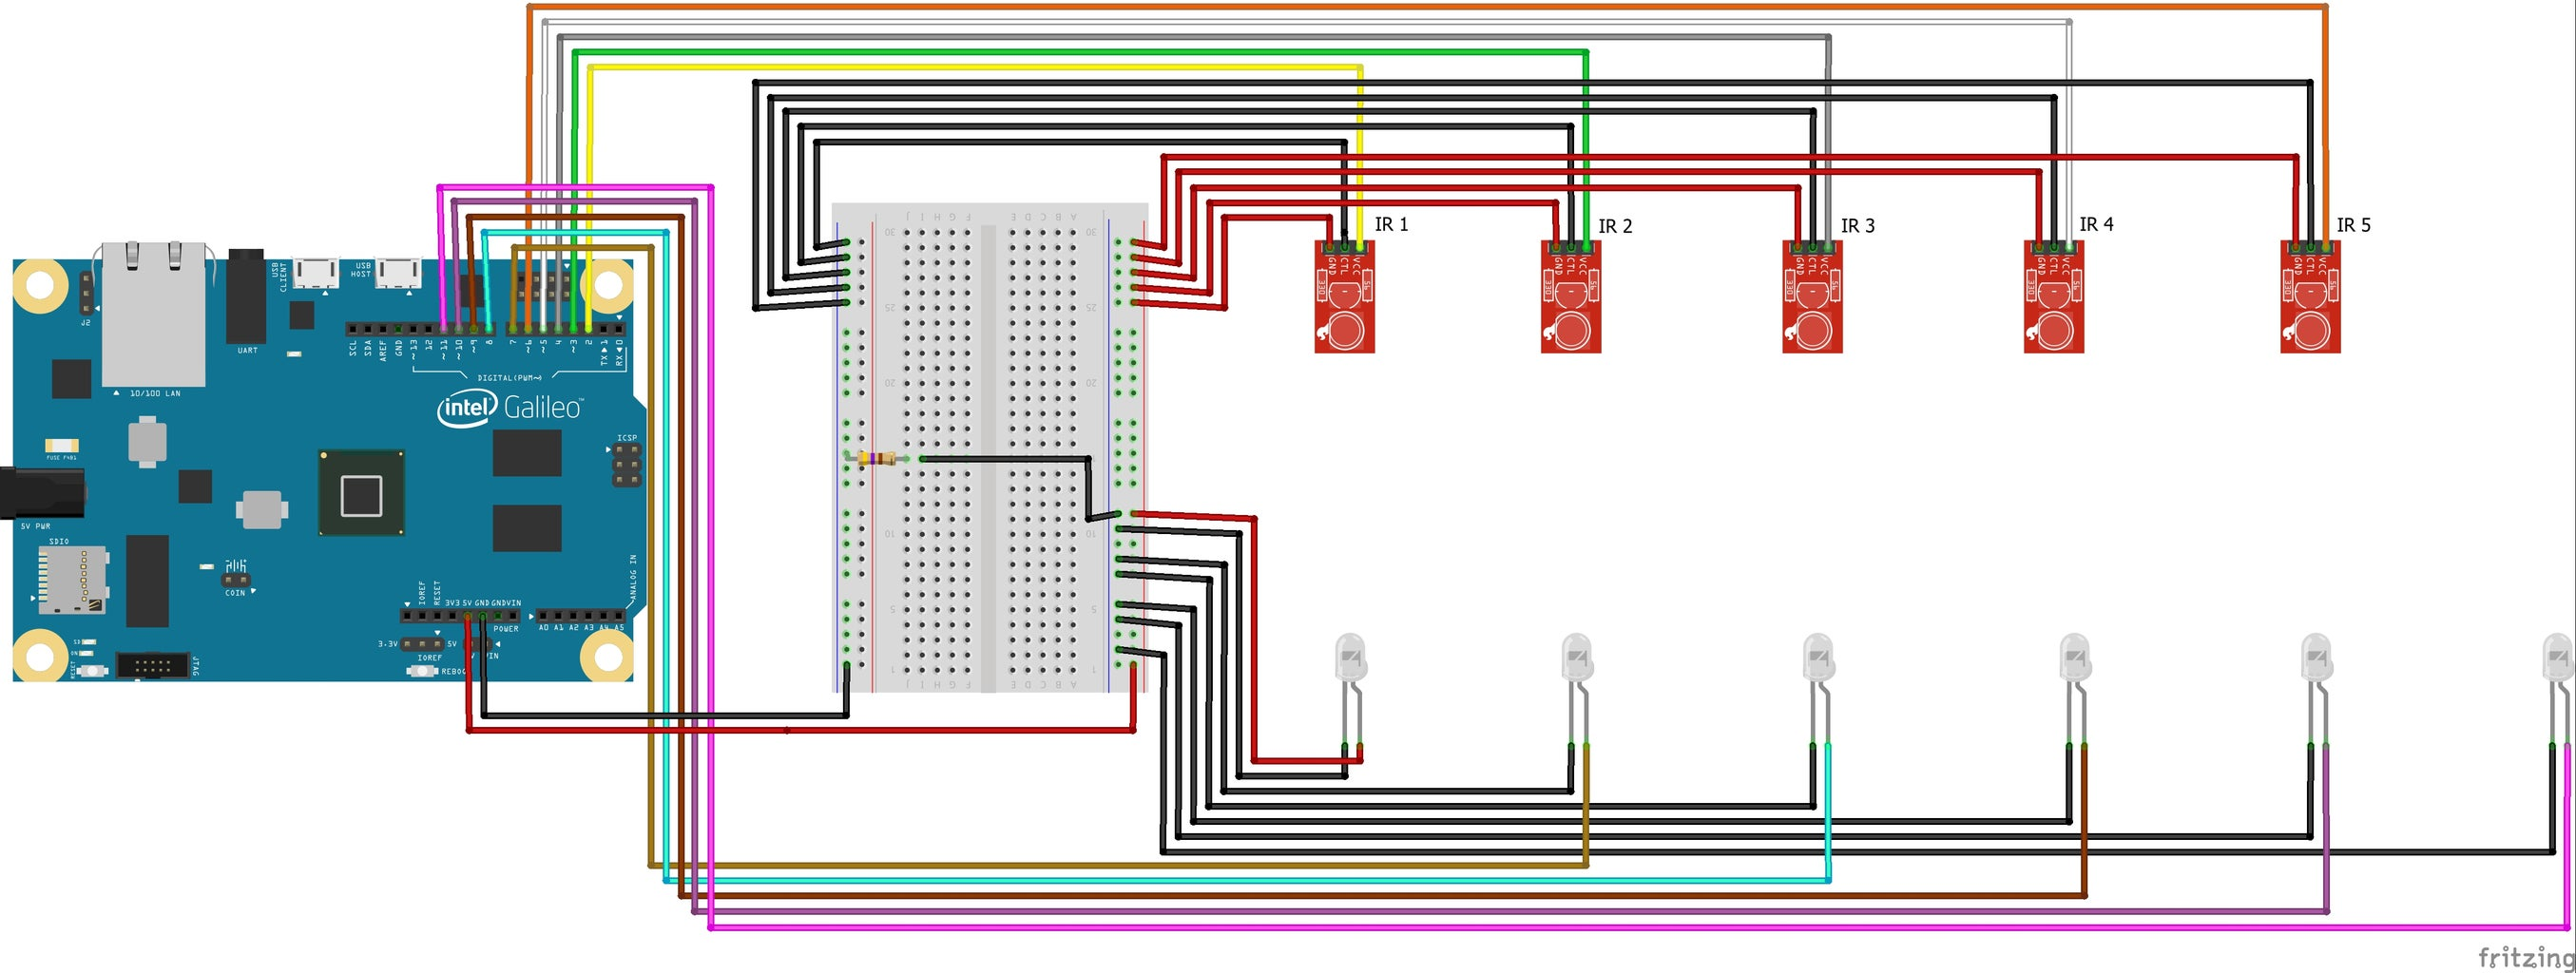 LED Interfacing With Intel Galileo: